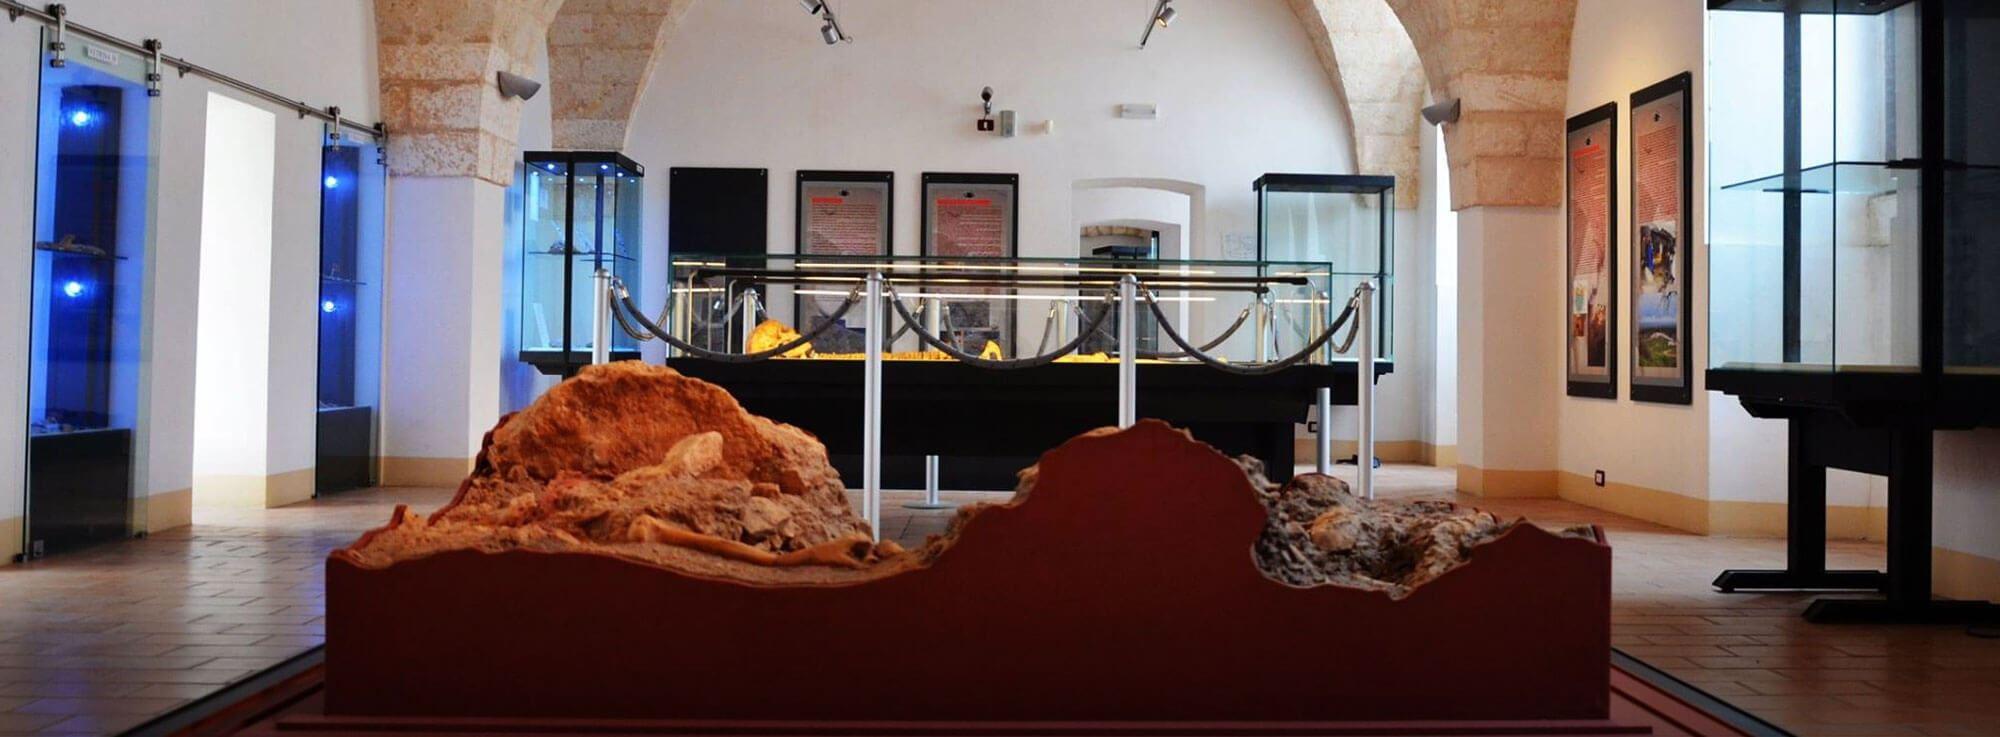 Ostuni: Weekend al Museo